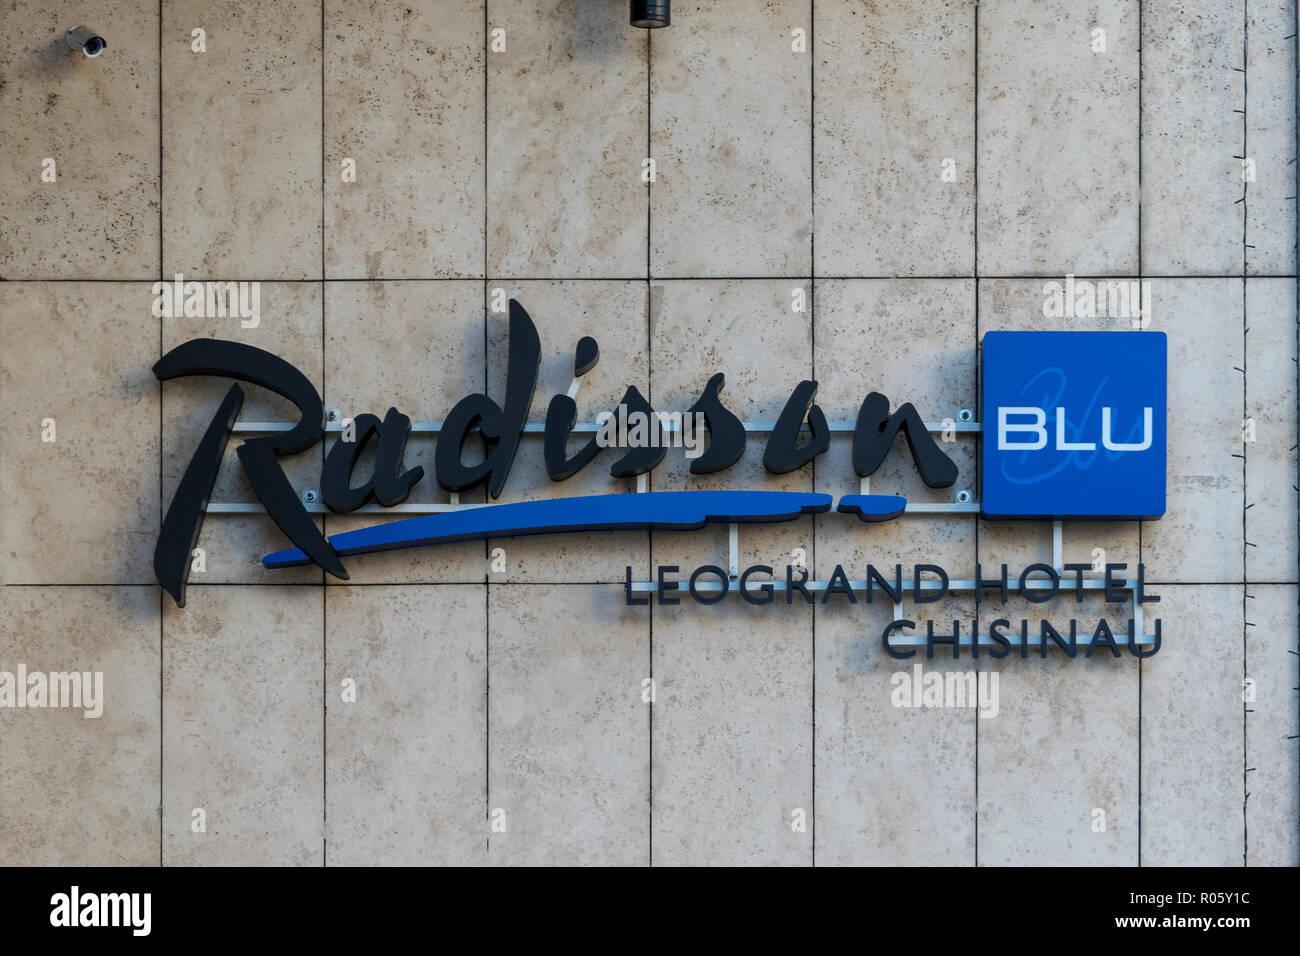 CHISINAU, MOLDOVA - 31 DECEMBER, 2017: The logo of Radisson Blu Hotel in Chisinau, Republic of Moldova. - Stock Image